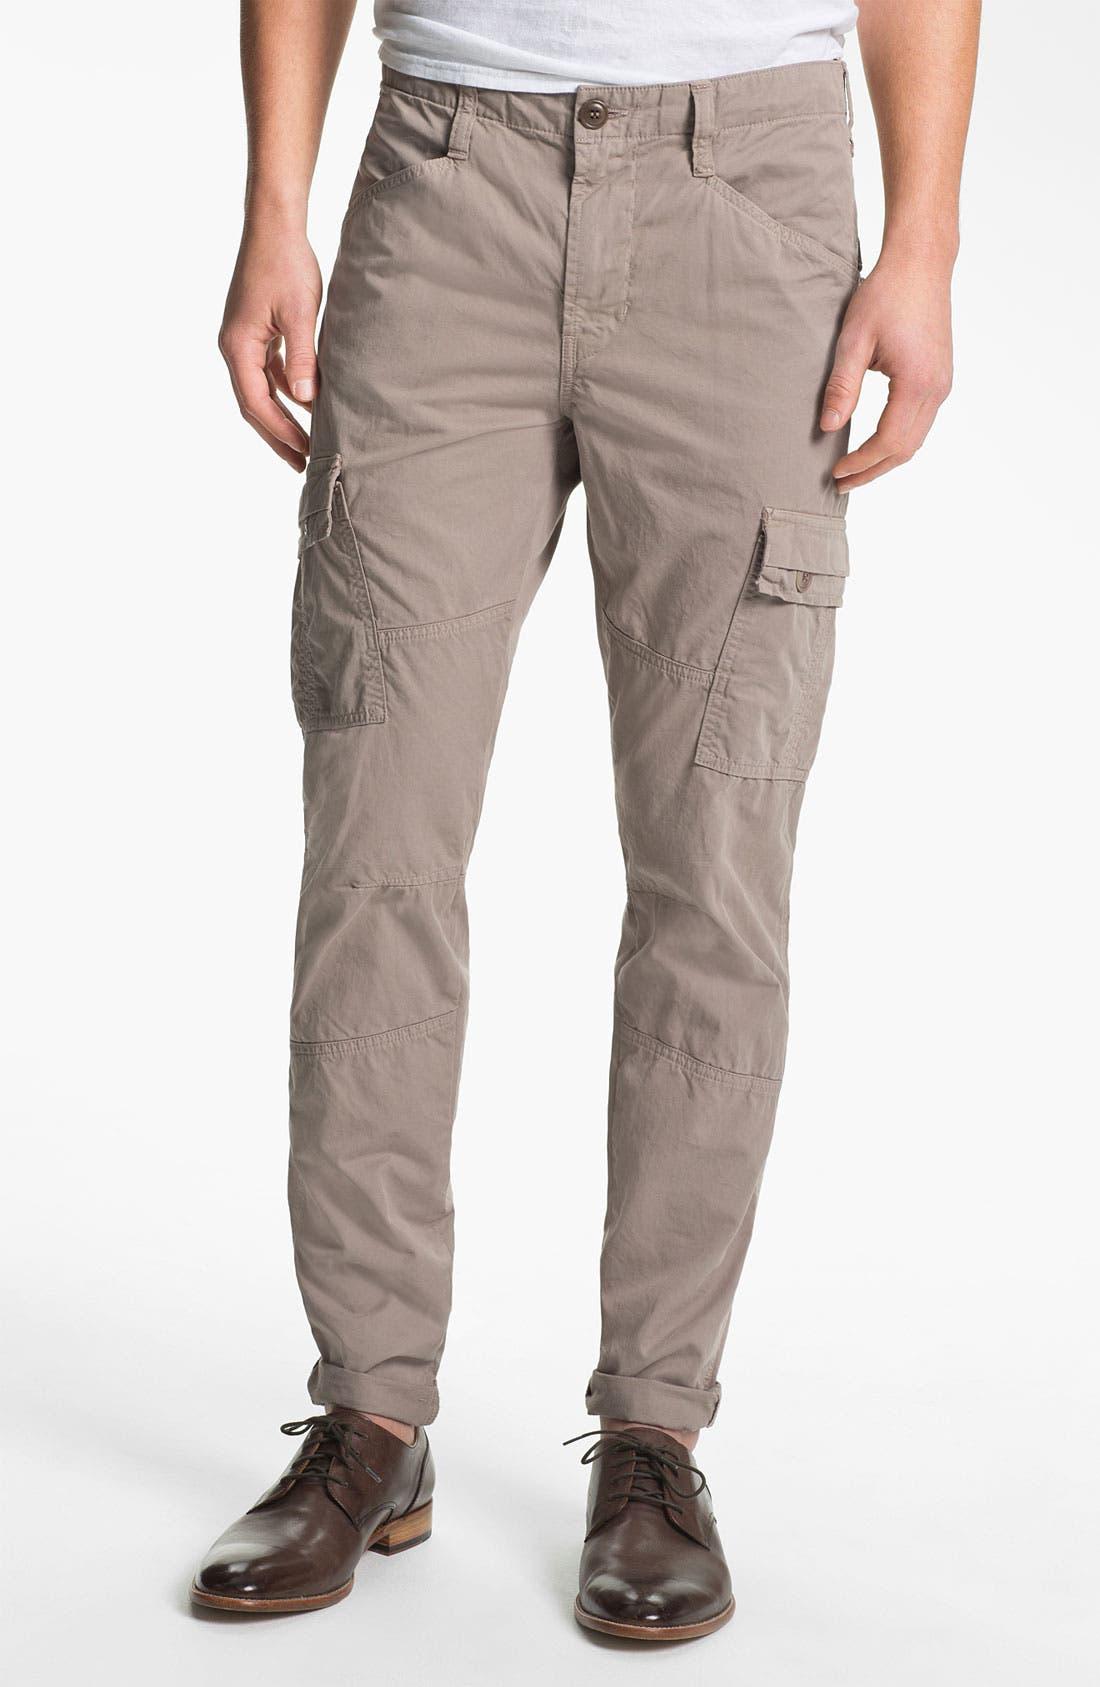 Alternate Image 1 Selected - J Brand 'Trooper' Slim Cargo Pants